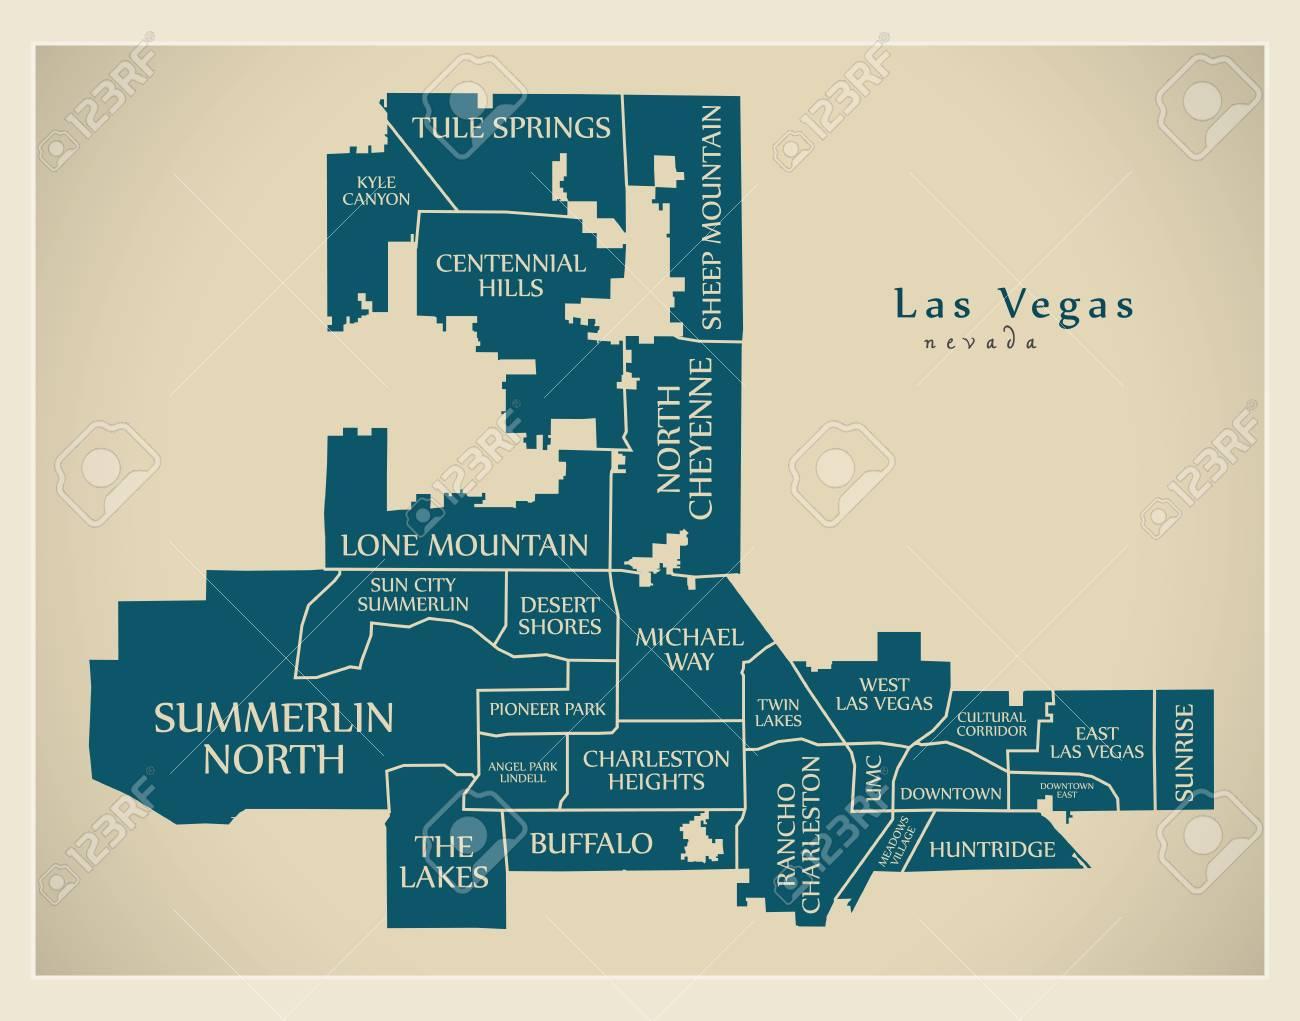 Map Las Vegas Nv on henderson nv map, chandler az map, virginia beach va map, silver peak nv map, kingman az map, california nv map, mesquite nv map, yuma az map, primm nv map, spokane wa map, san diego ca map, hoover dam nv map, yerington nv map, nellis afb nv map, coyote springs nv map, lake mead nv map, summerlin nv map, seattle wa map, st. george nv map, glendale az map,